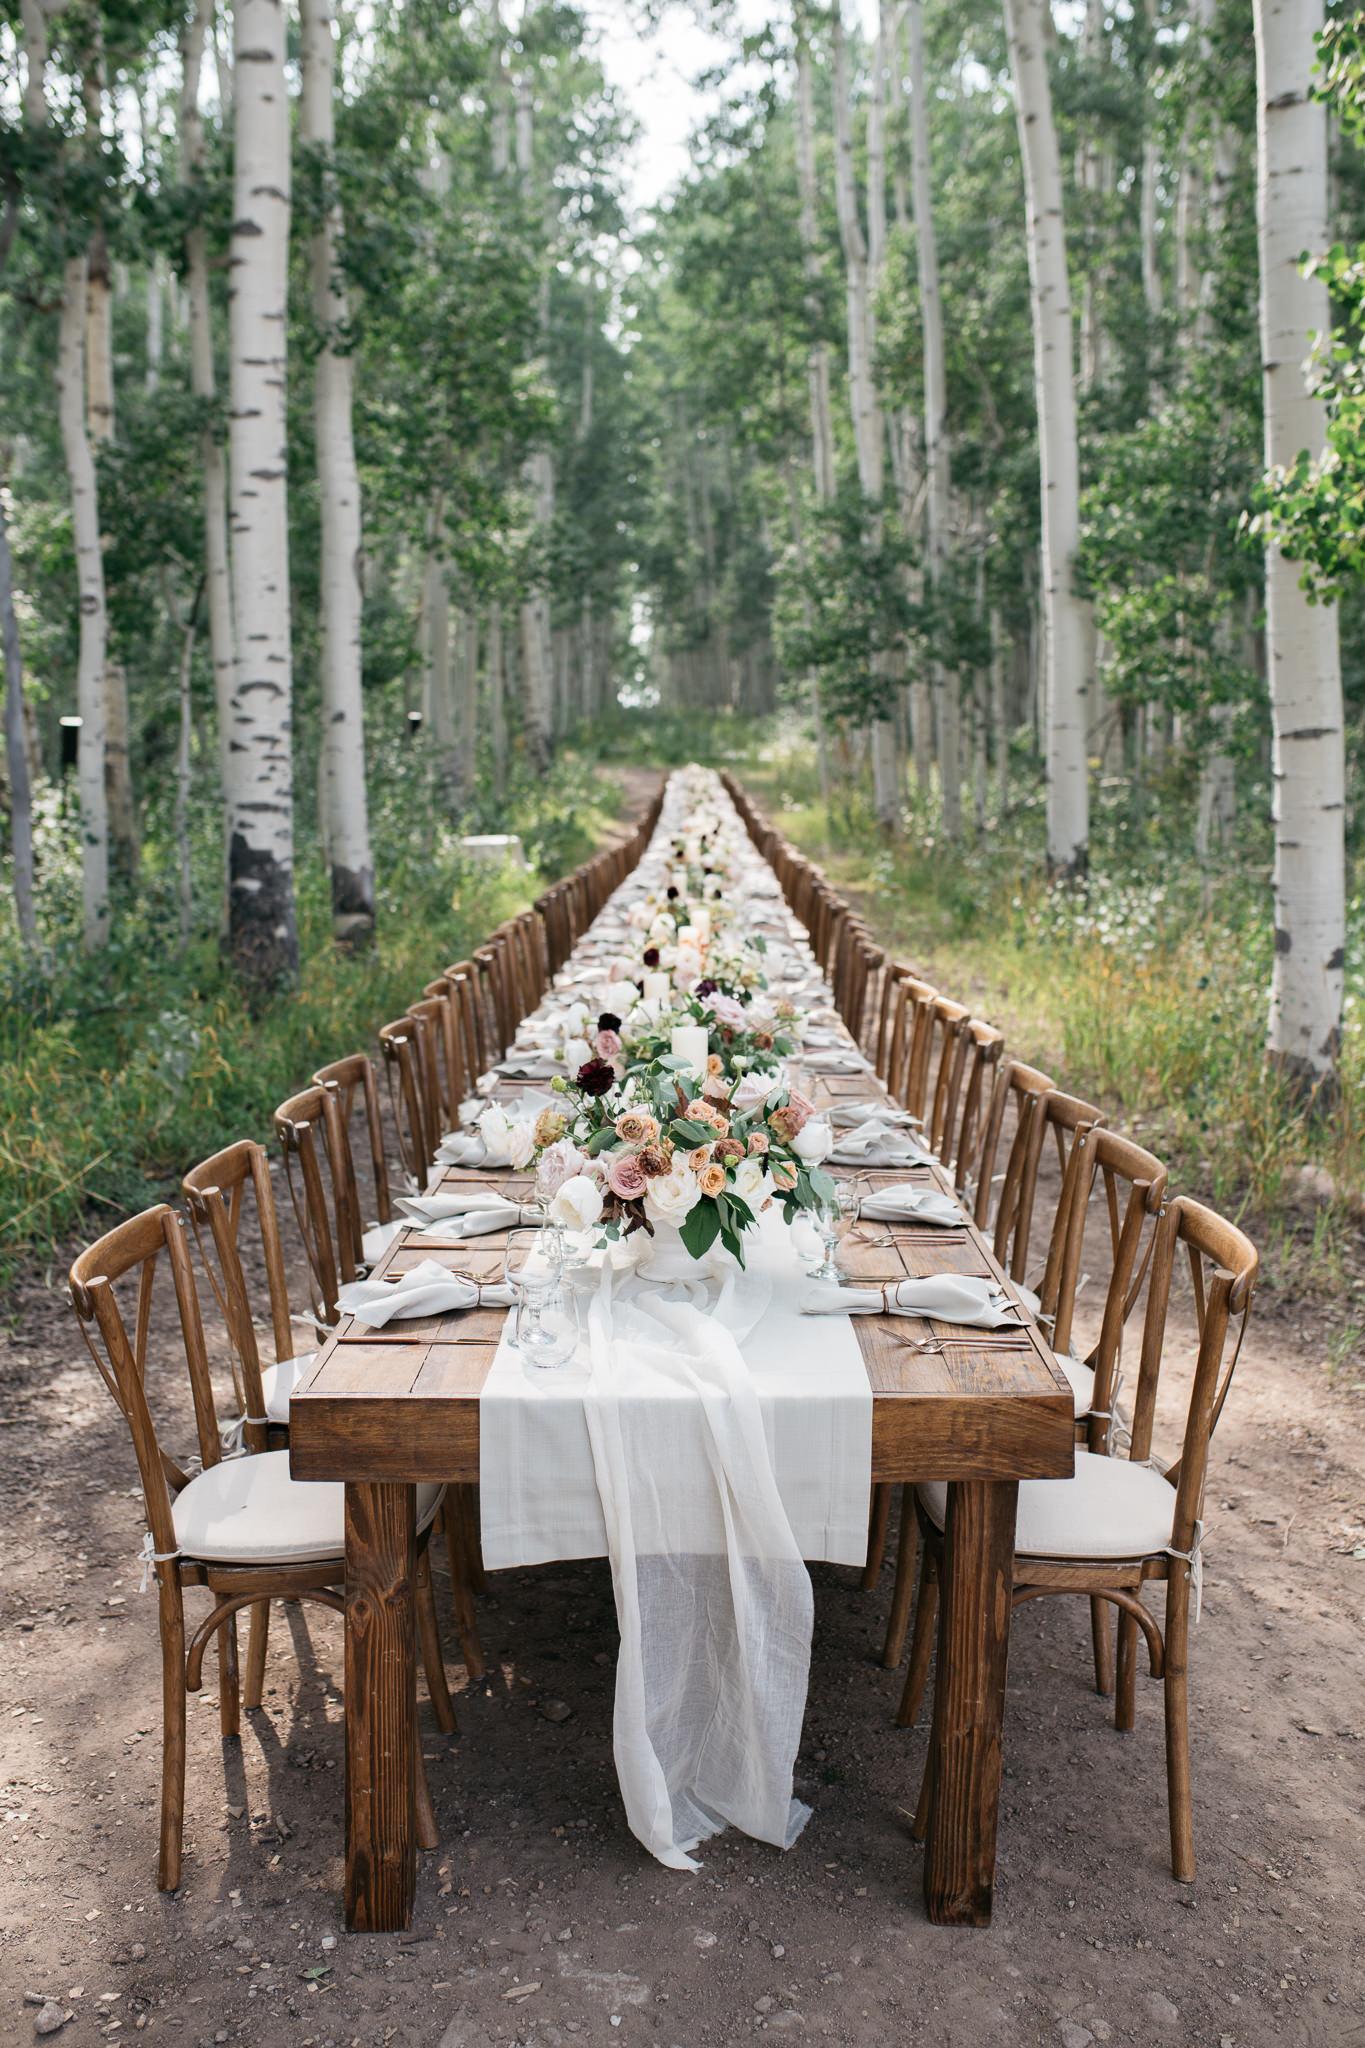 434_ONL_Kat_Nick_Wedding_Trevor_Hooper_Photo.jpg